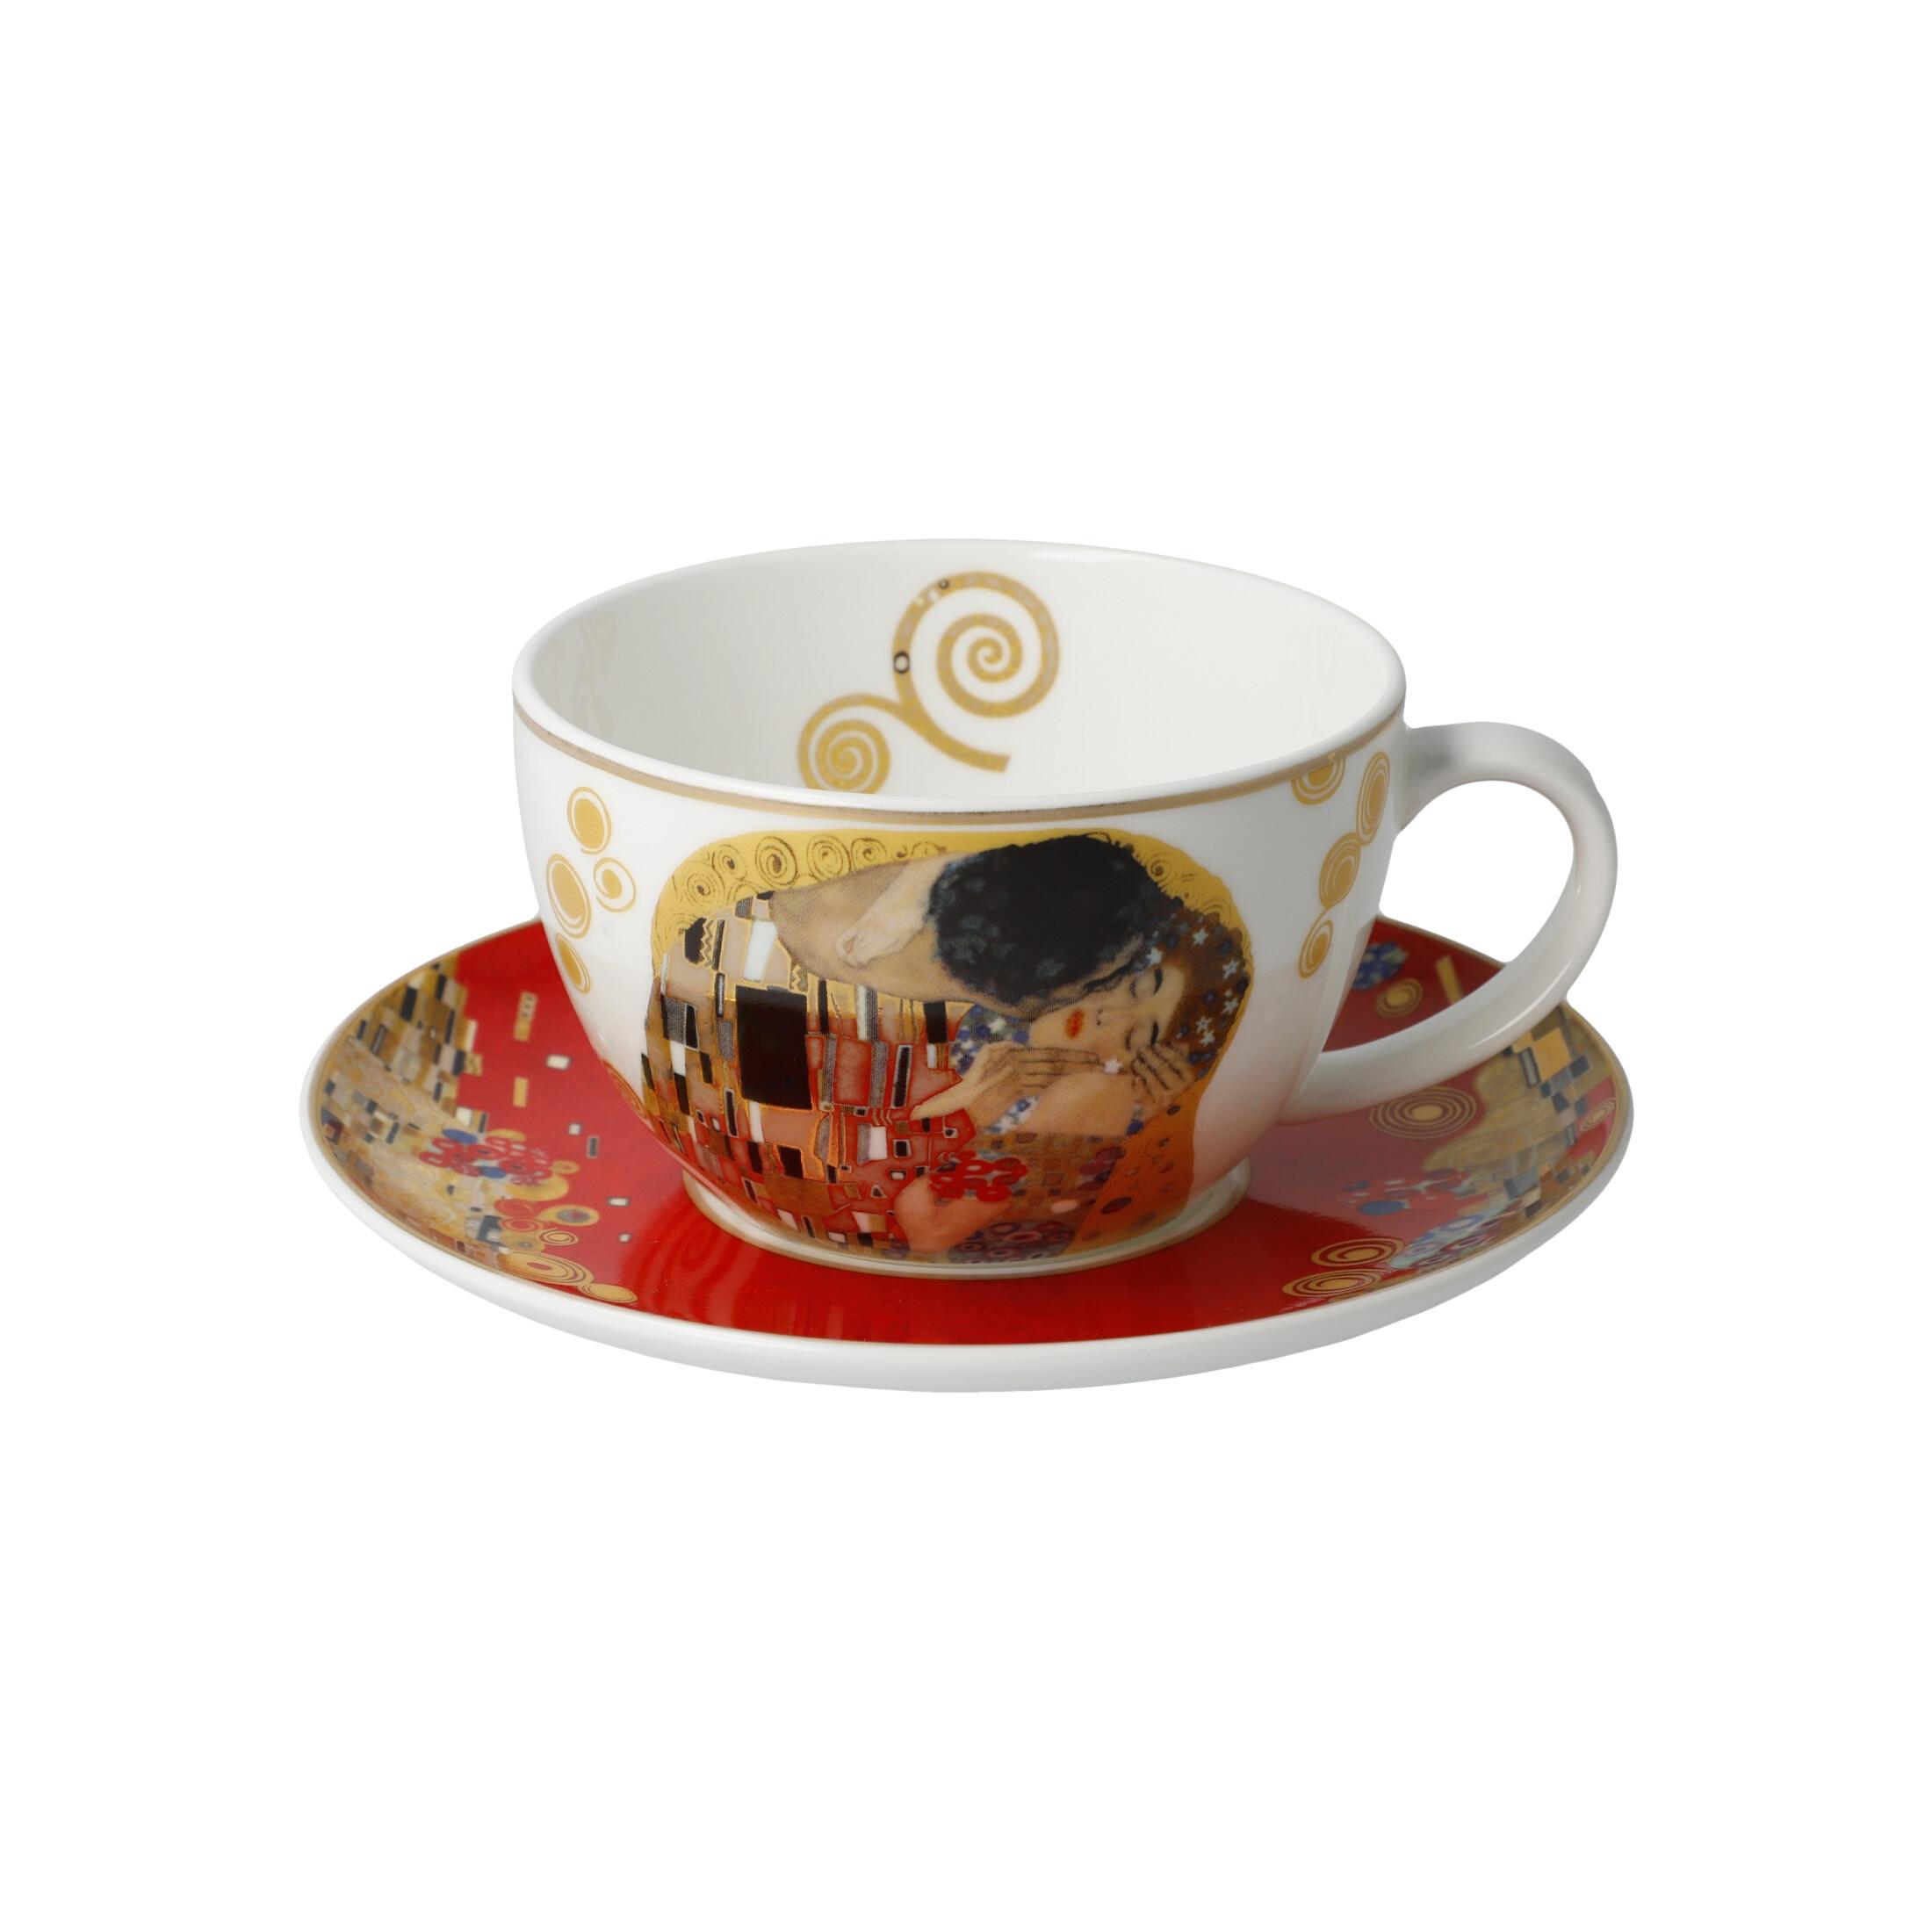 Goebel Artis Orbis Gustav Klimt Christmas Time 'Der Kuss Rot - Tee-/Cappuccinotasse' 2021 !